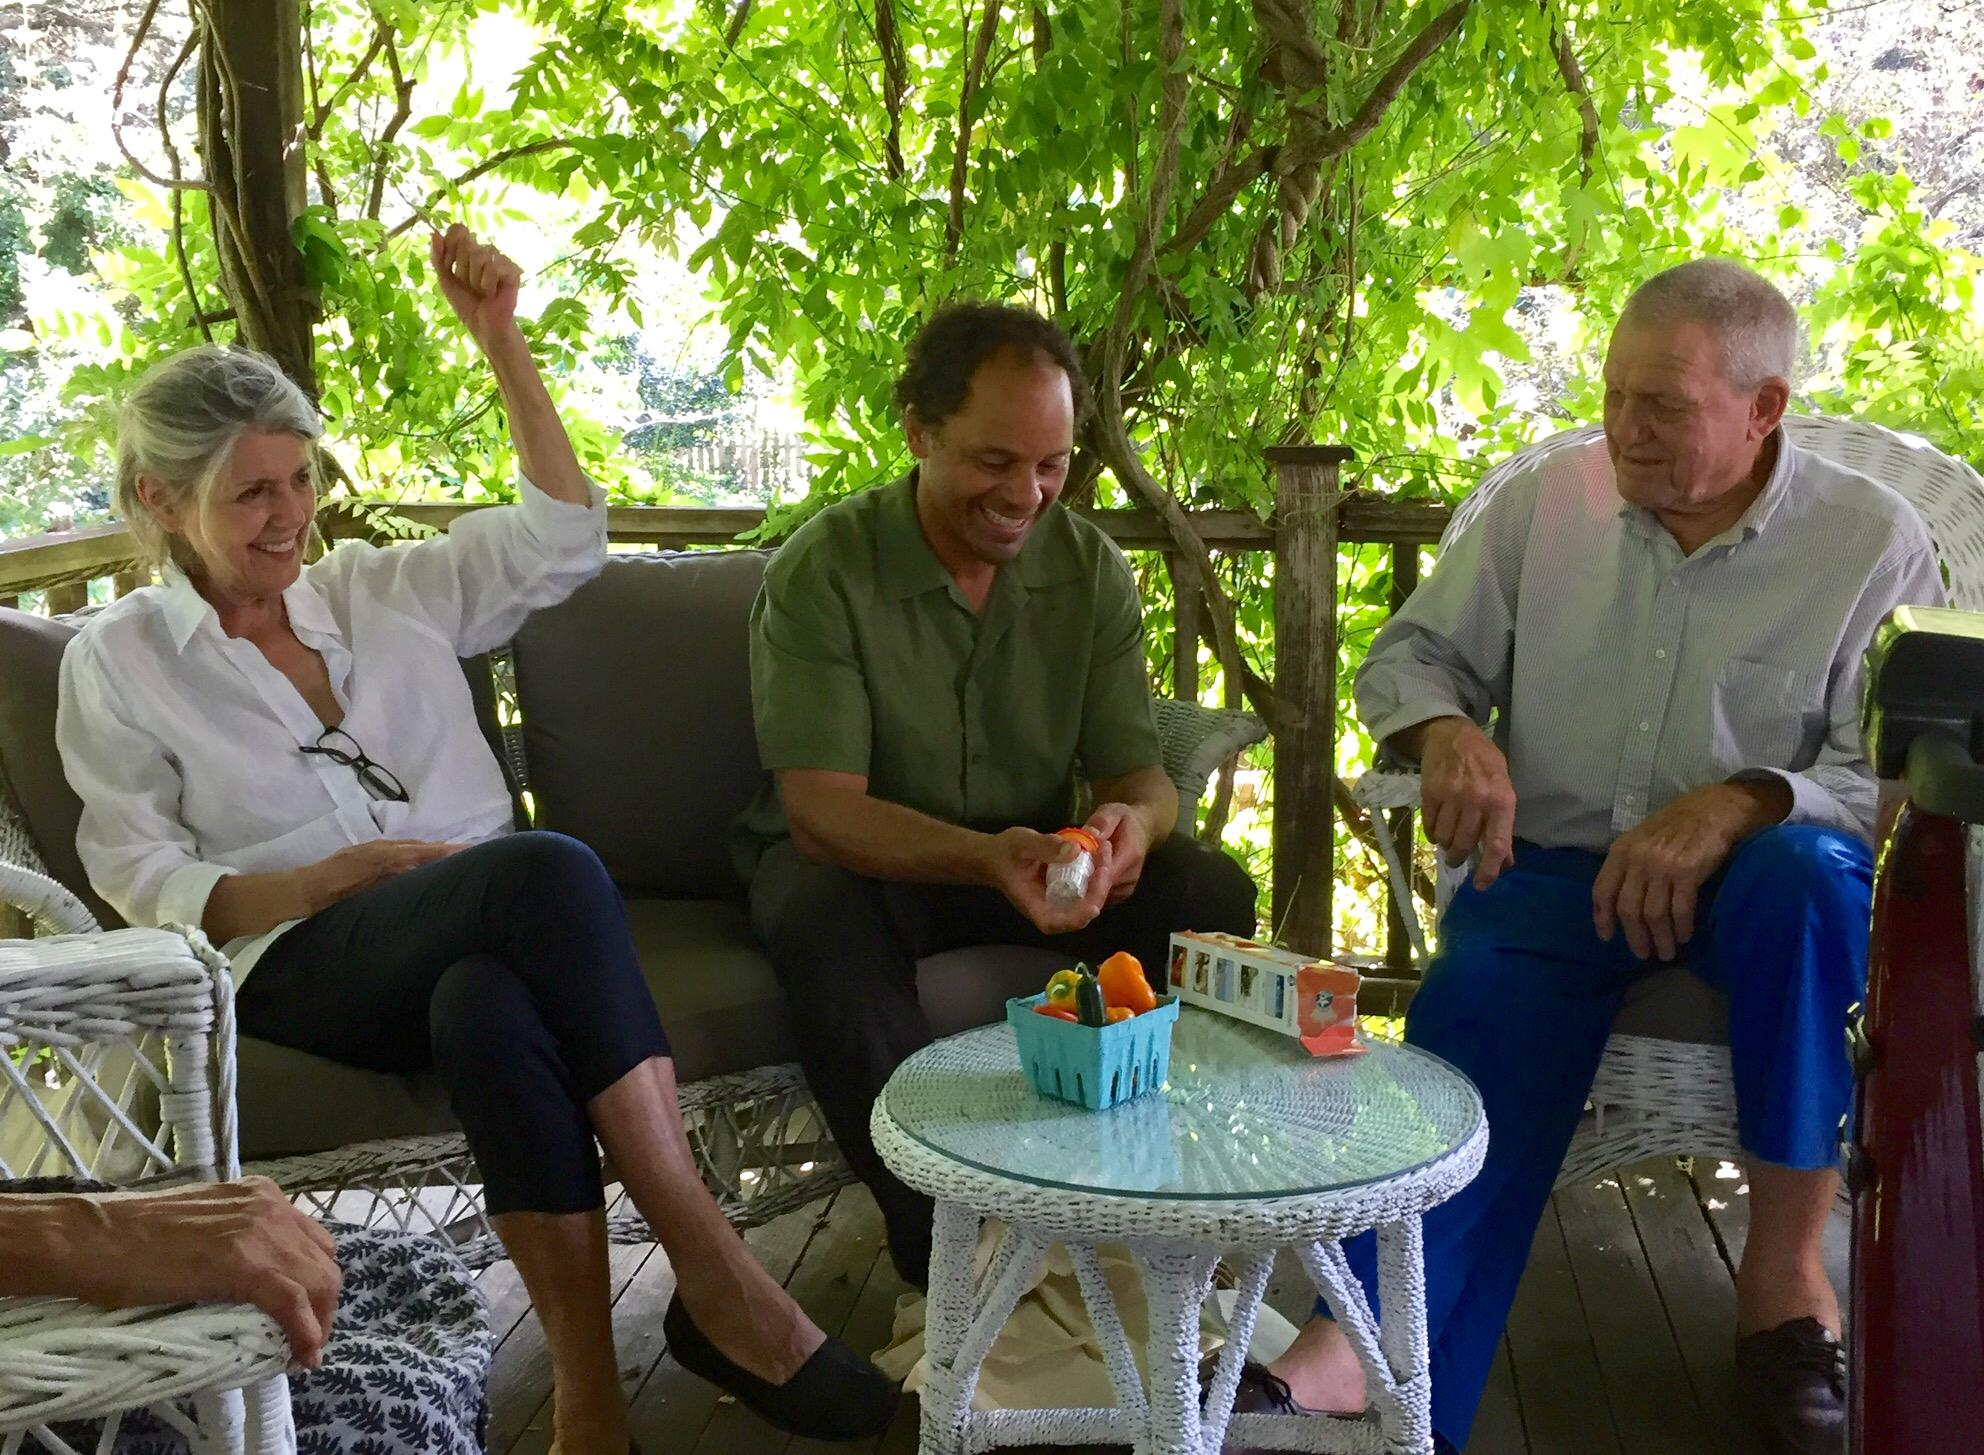 Paula Cooper, Jeremy Grosvenor, and Robert Grosvenor, Long Island, NY, summer 2017. Photo by Jay Gorney.